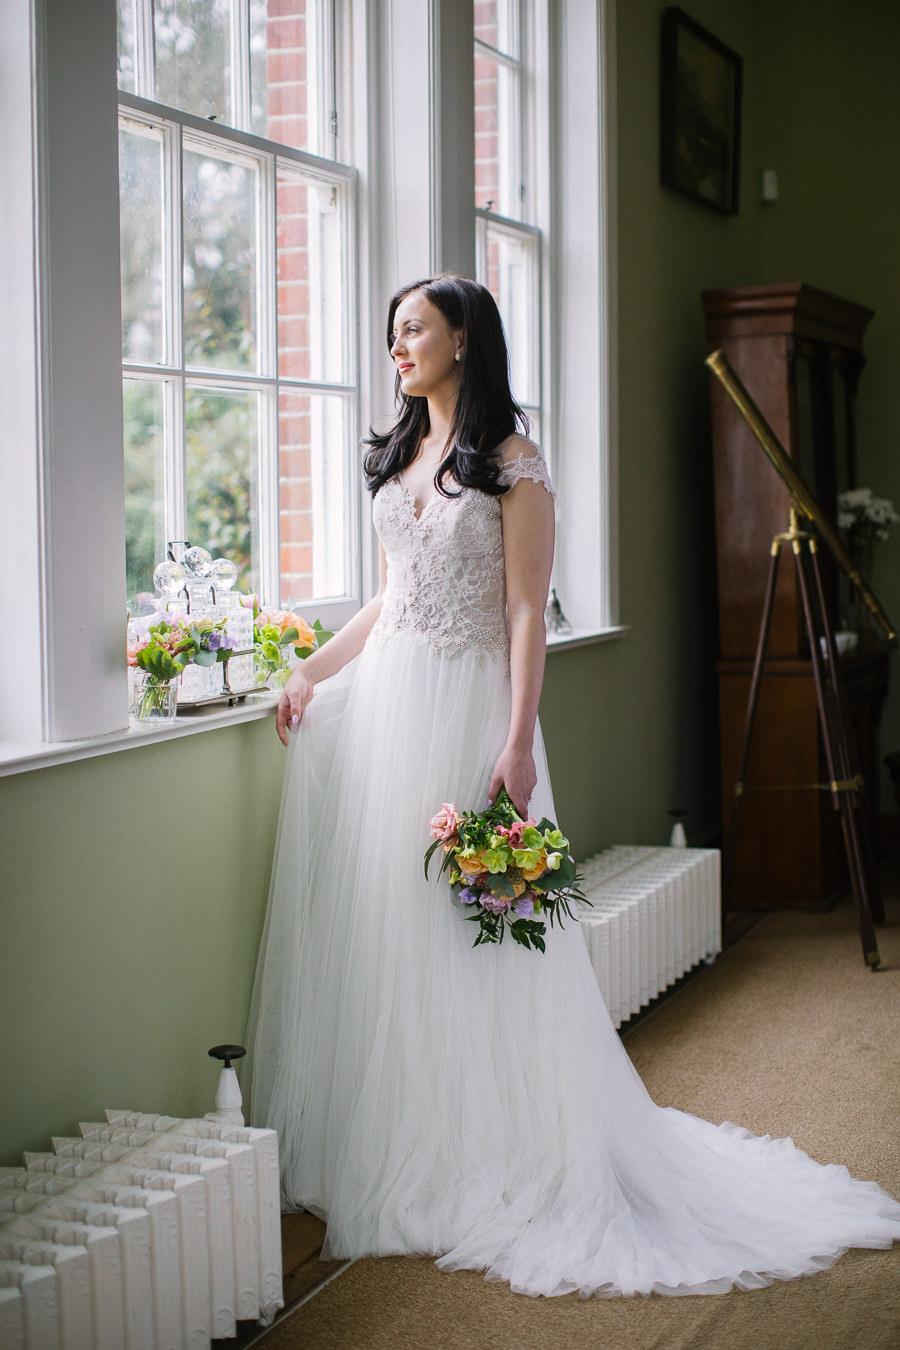 'Understated Elegance' Spring Styled Hampshire Bridal Shoot – Rownhams House, photo credit Nisha Haq Photography (7)